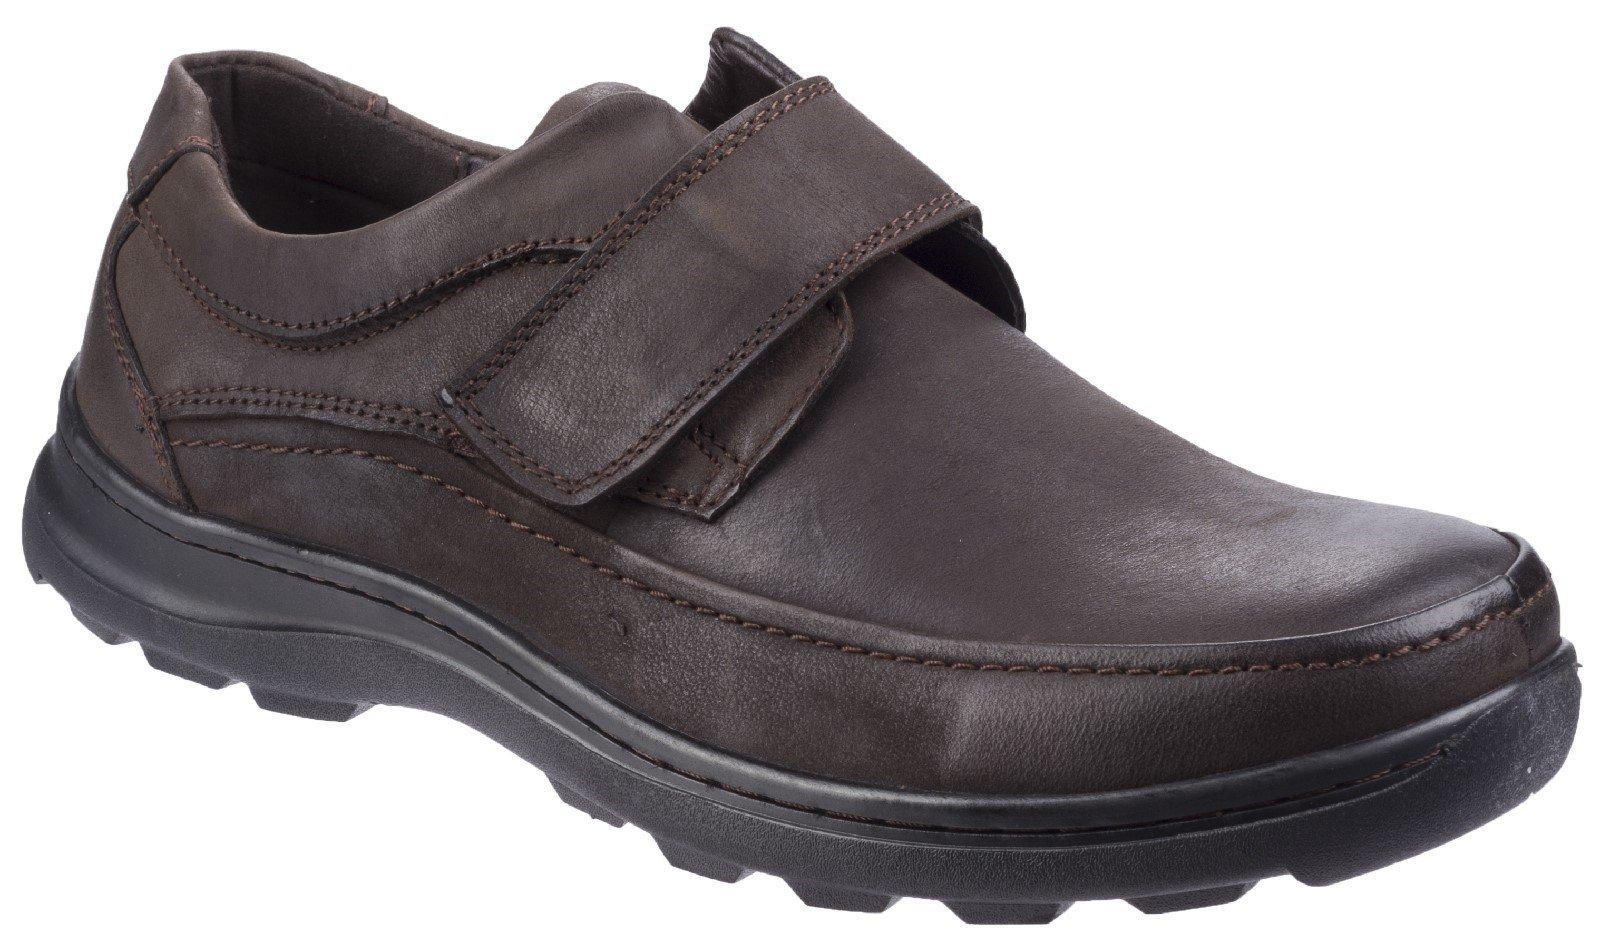 Fleet & Foster Men's Hurghada Fastening Shoe Various Colours 26314-43923 - Brown 7